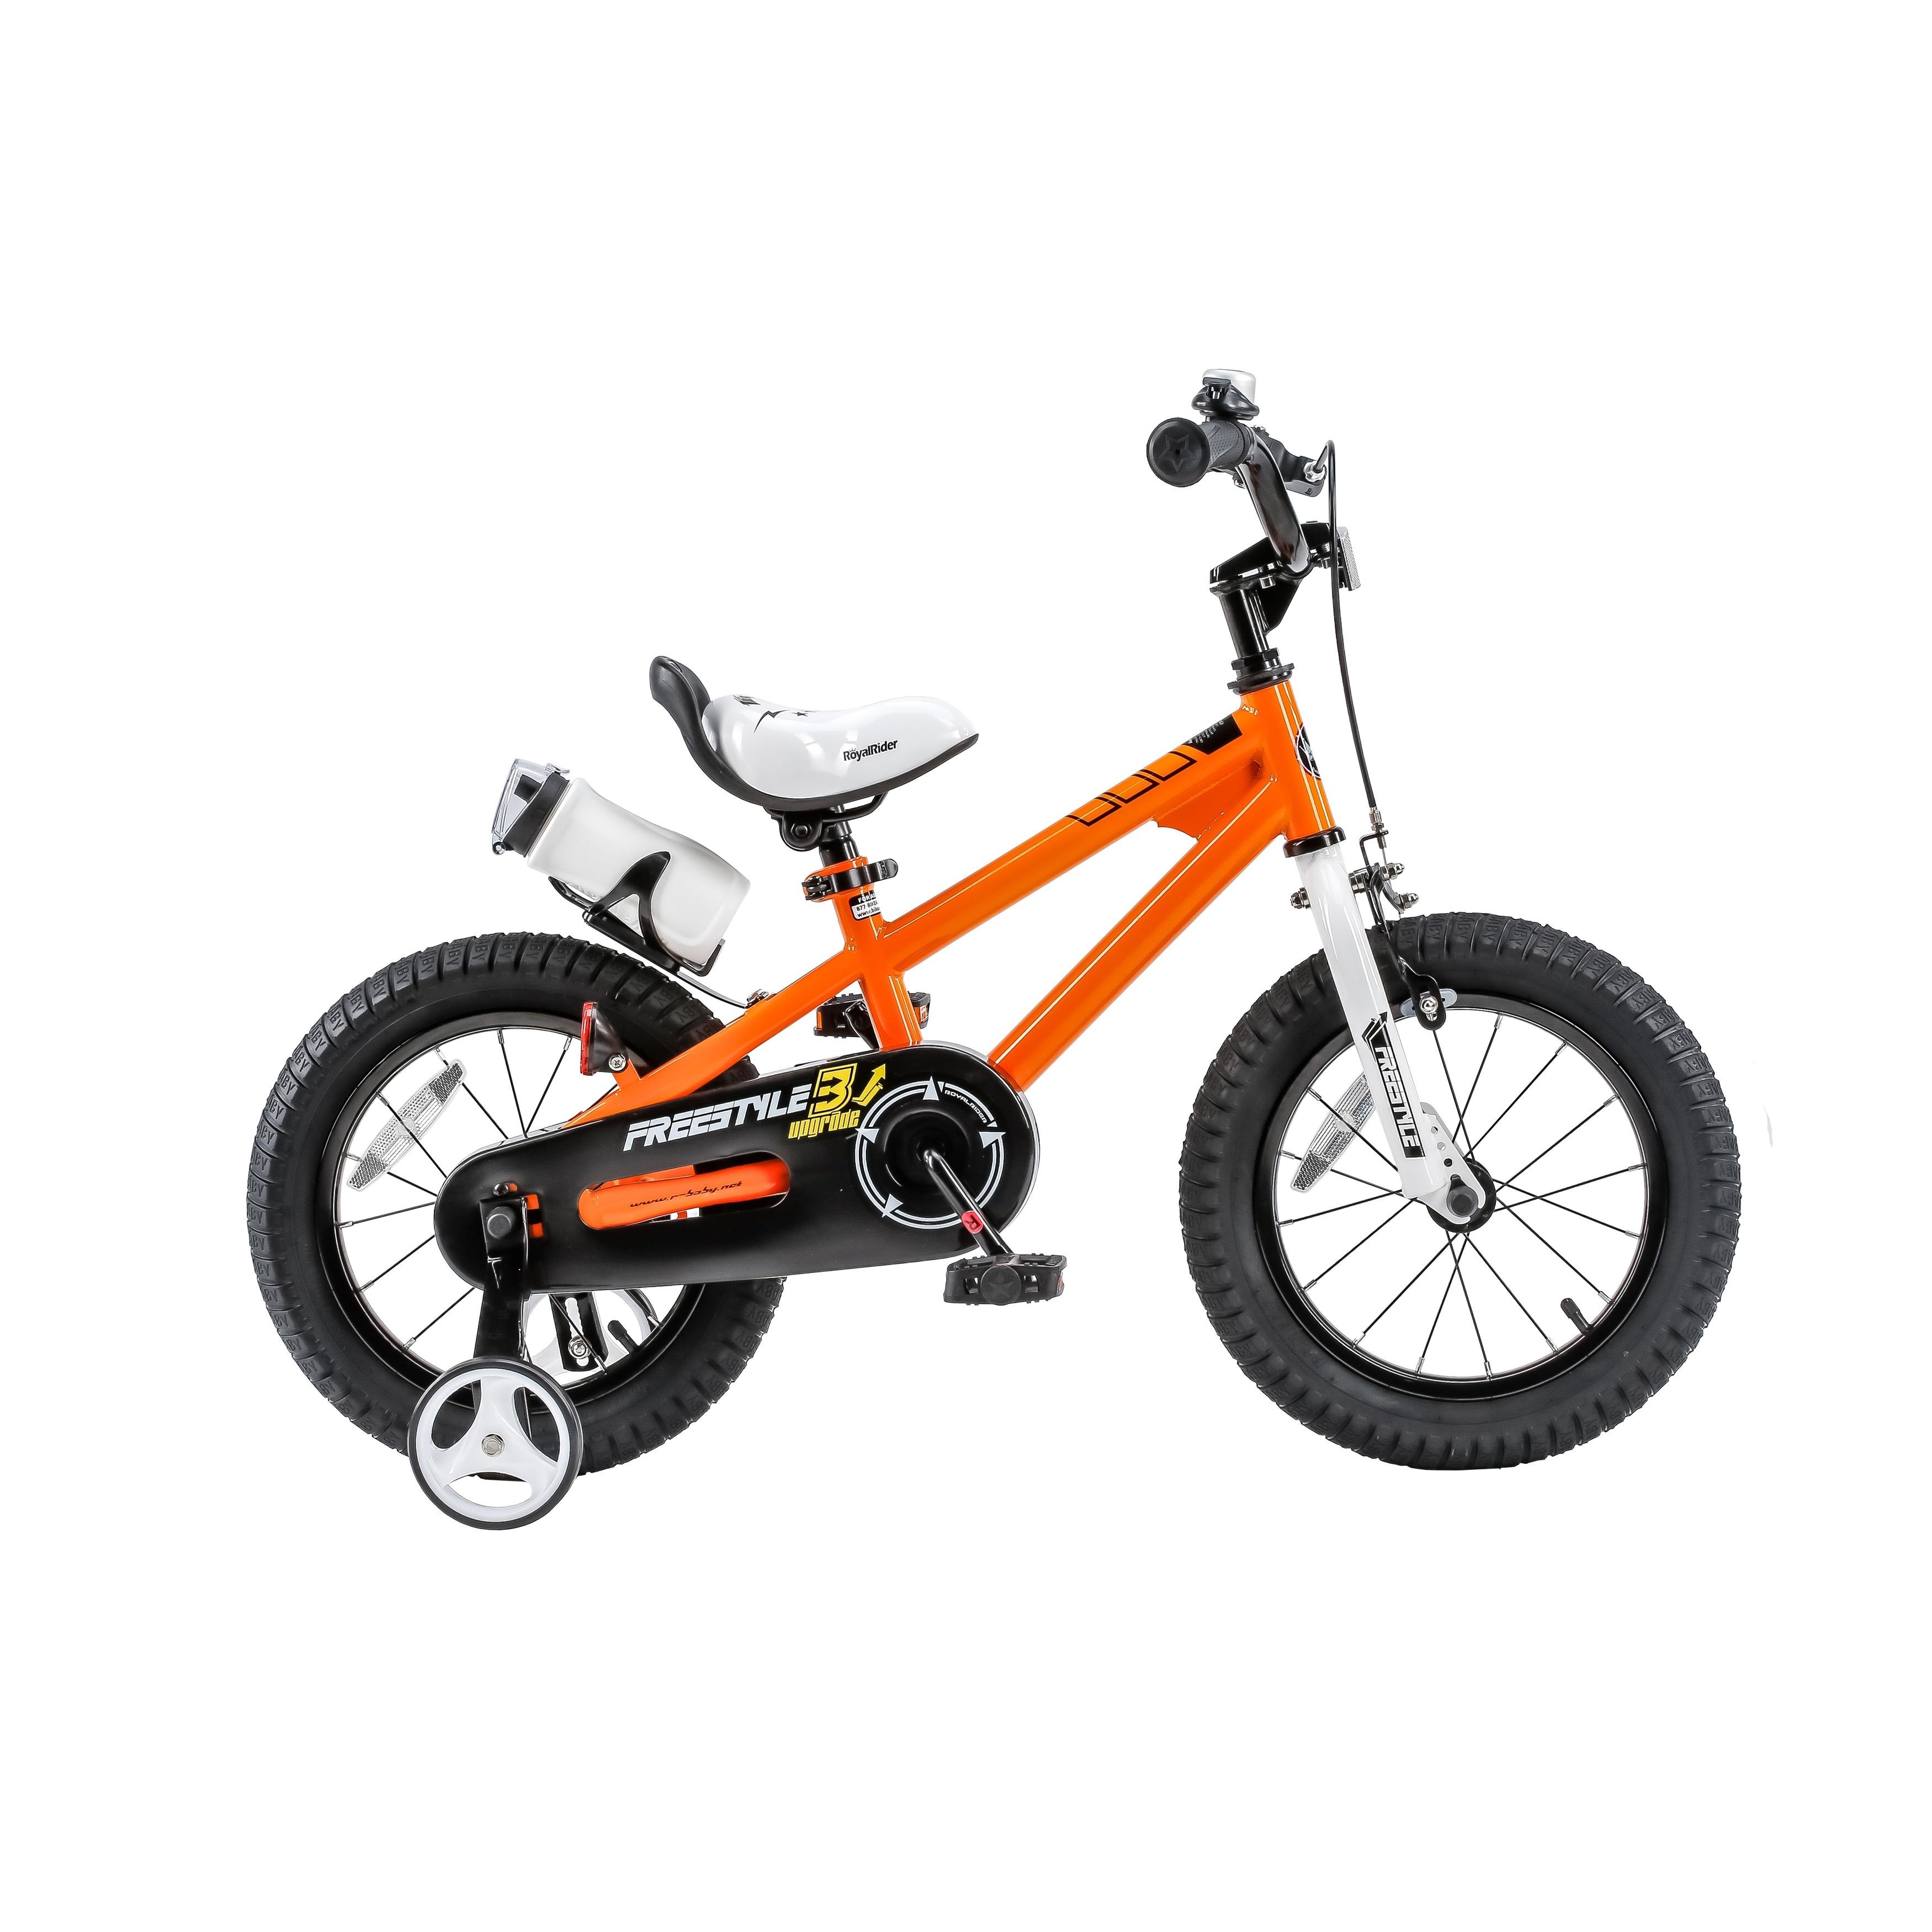 7c918e57eff Universal Stabilisers Child Kids Bike Cycle Bicycle Training Wheel. Shop  Royalbaby Bmx Freestyle Steel 14 Inch Kids Bike With Training